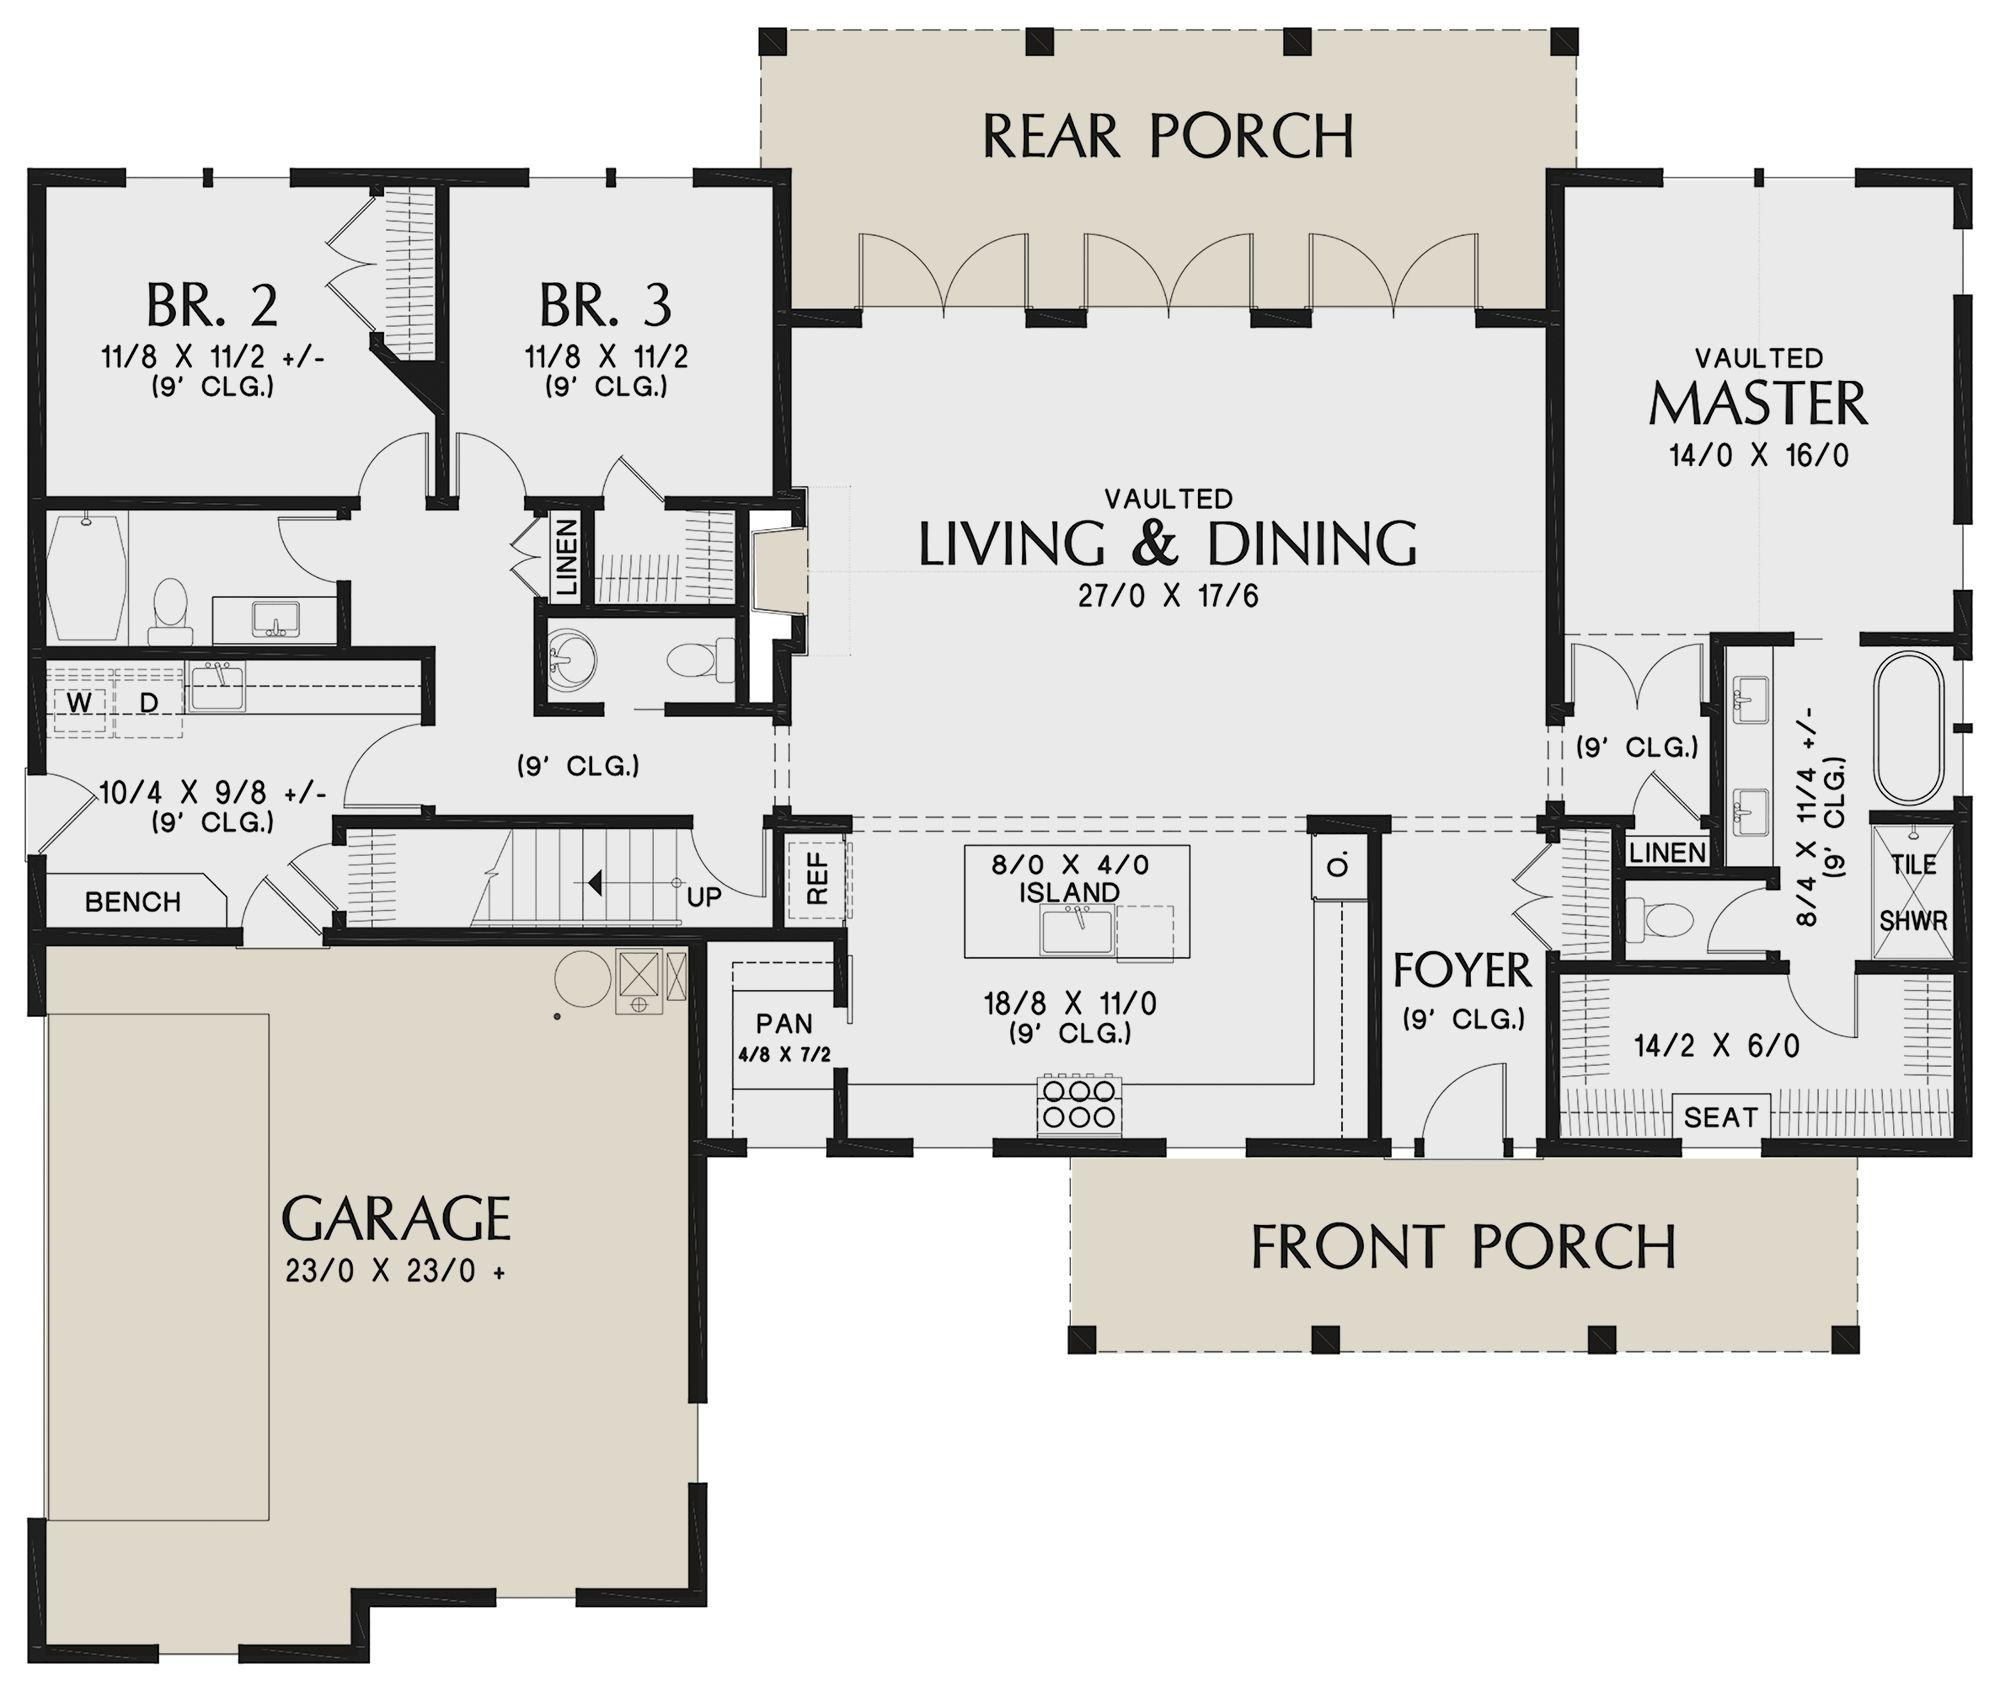 House Plan 2559 00832 Modern Farmhouse Plan 2 104 Square Feet 3 Bedrooms 2 5 Bathrooms Modern Farmhouse Plans Lake House Plans Farmhouse Plans